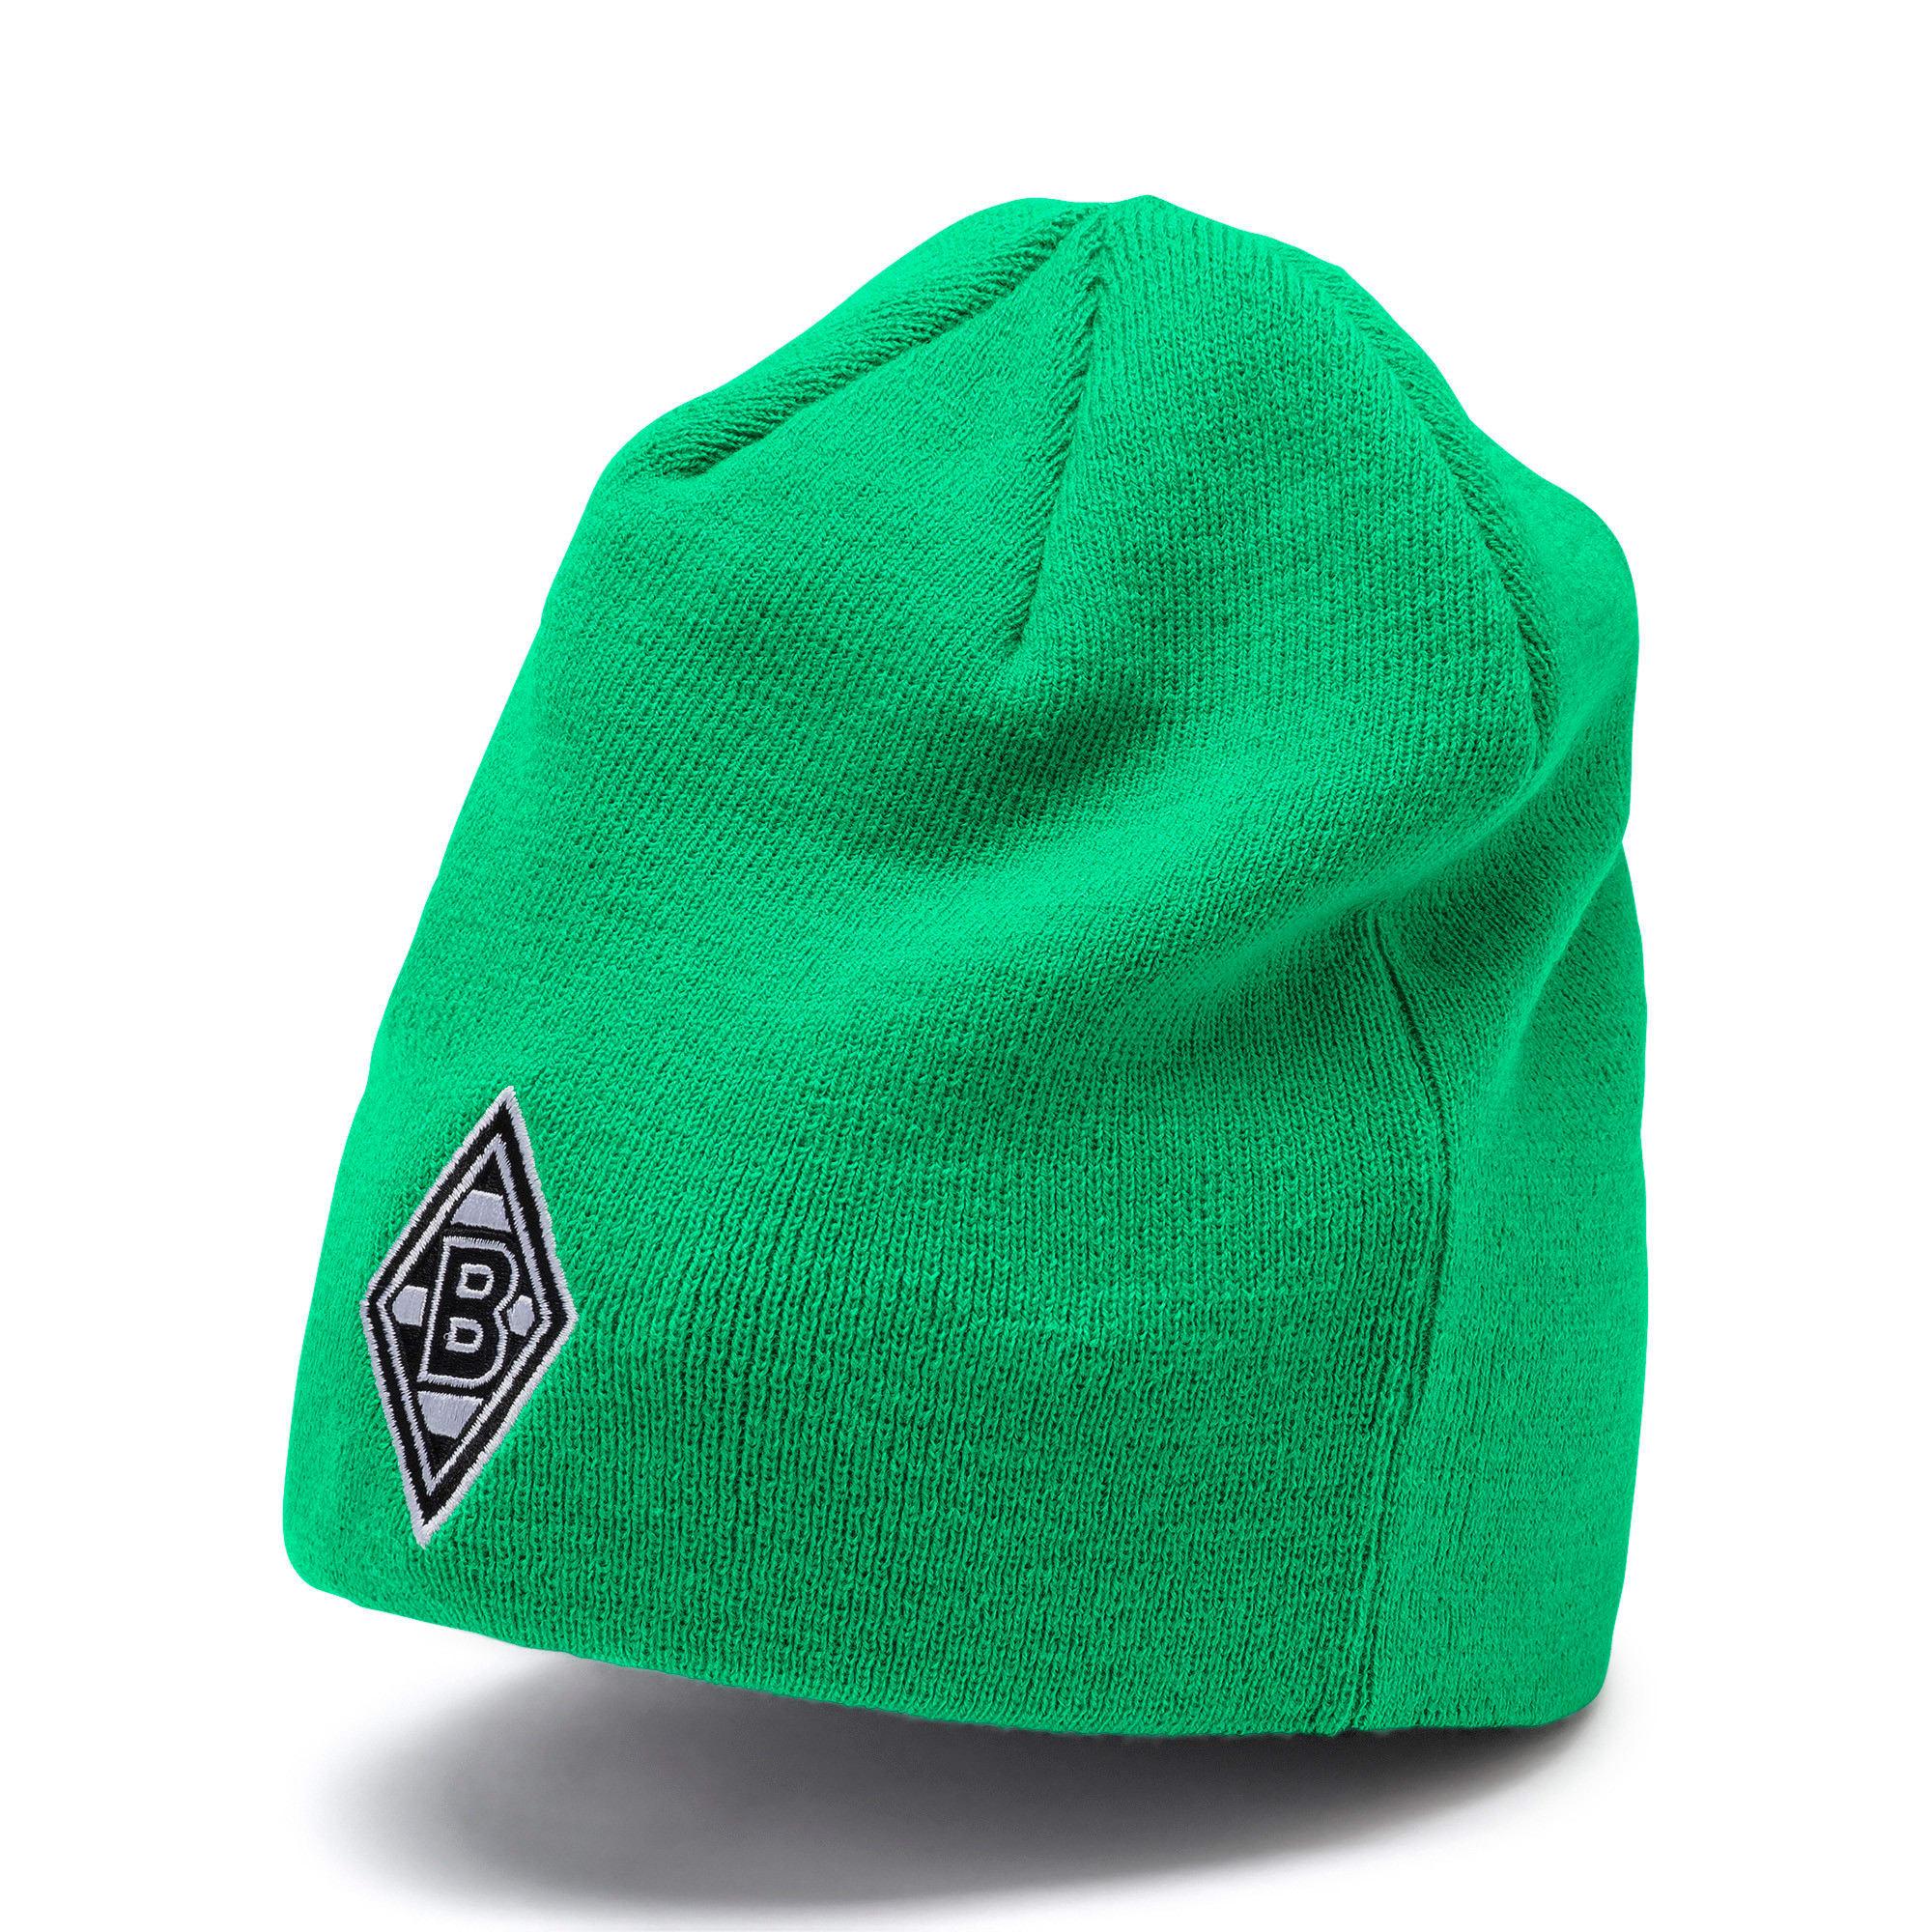 Thumbnail 3 of Borussia Mönchengladbach Reversible Beanie, Puma Black-Bright Green, medium